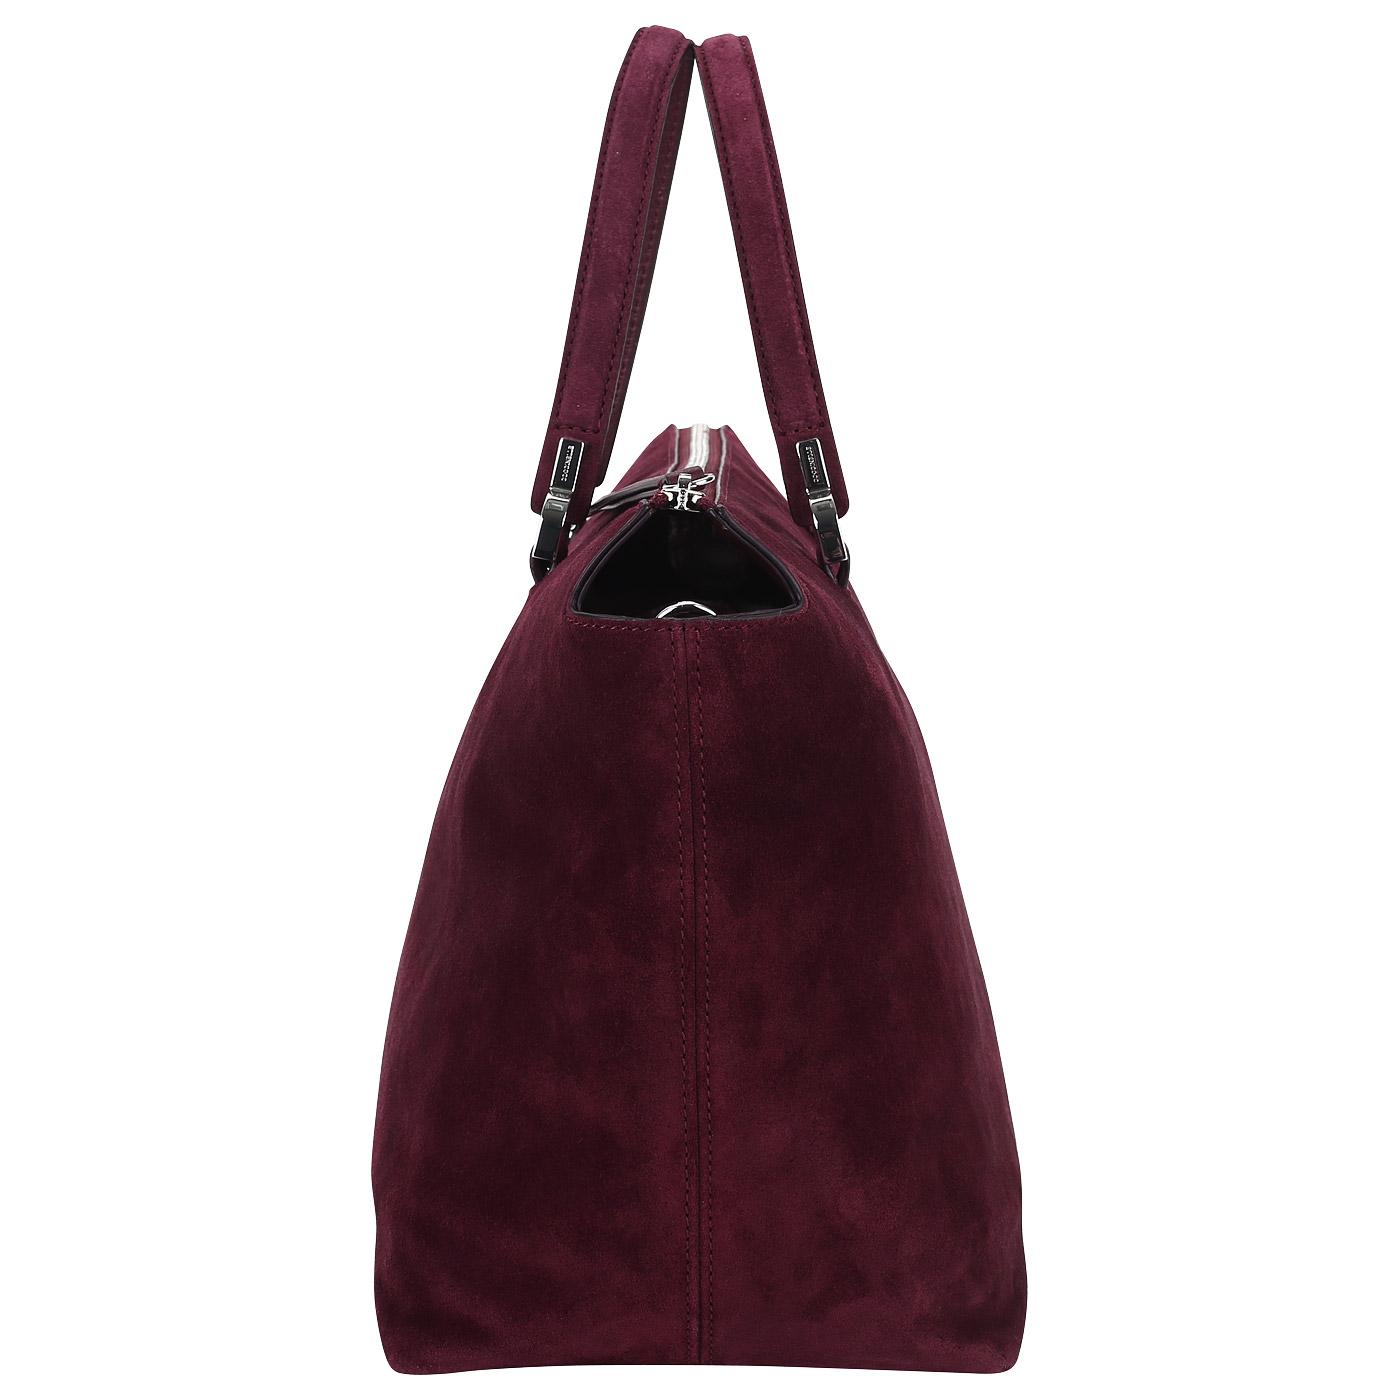 2b0747a2a819 Вместительная сумка из замши Coccinelle Keyla suede CI1 18 01 ...